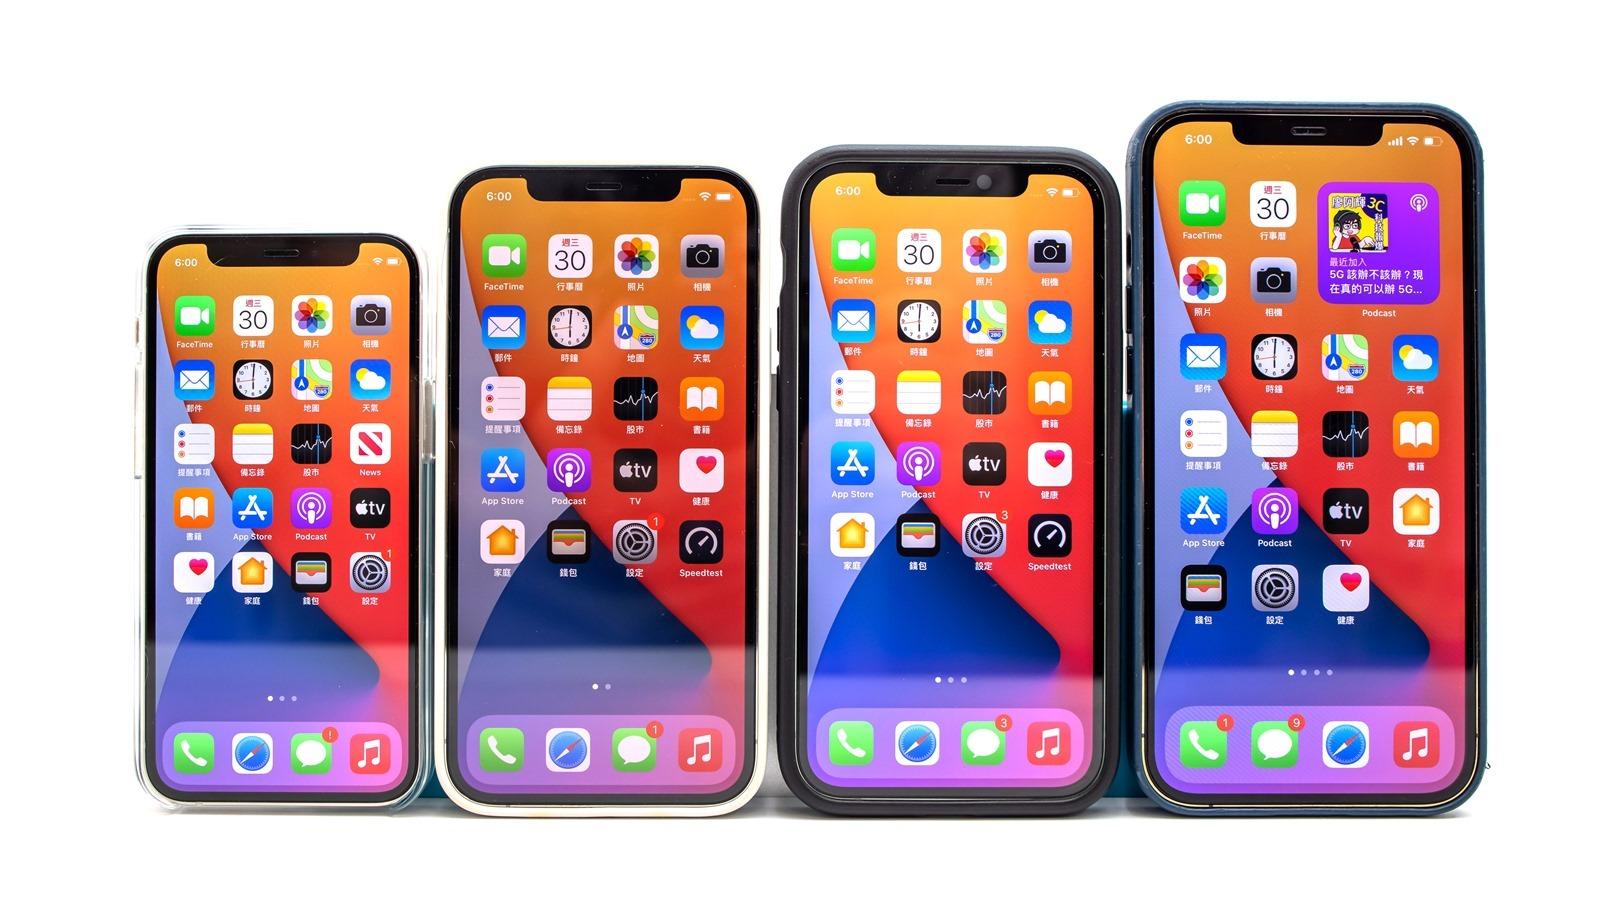 iPhone 12 專屬全套完美保護!手殘也能貼好的 hoda 藍寶石保護貼+貼膜神器,還有藍寶石鏡頭貼 + 新款防窺 / 抗藍光 @3C 達人廖阿輝